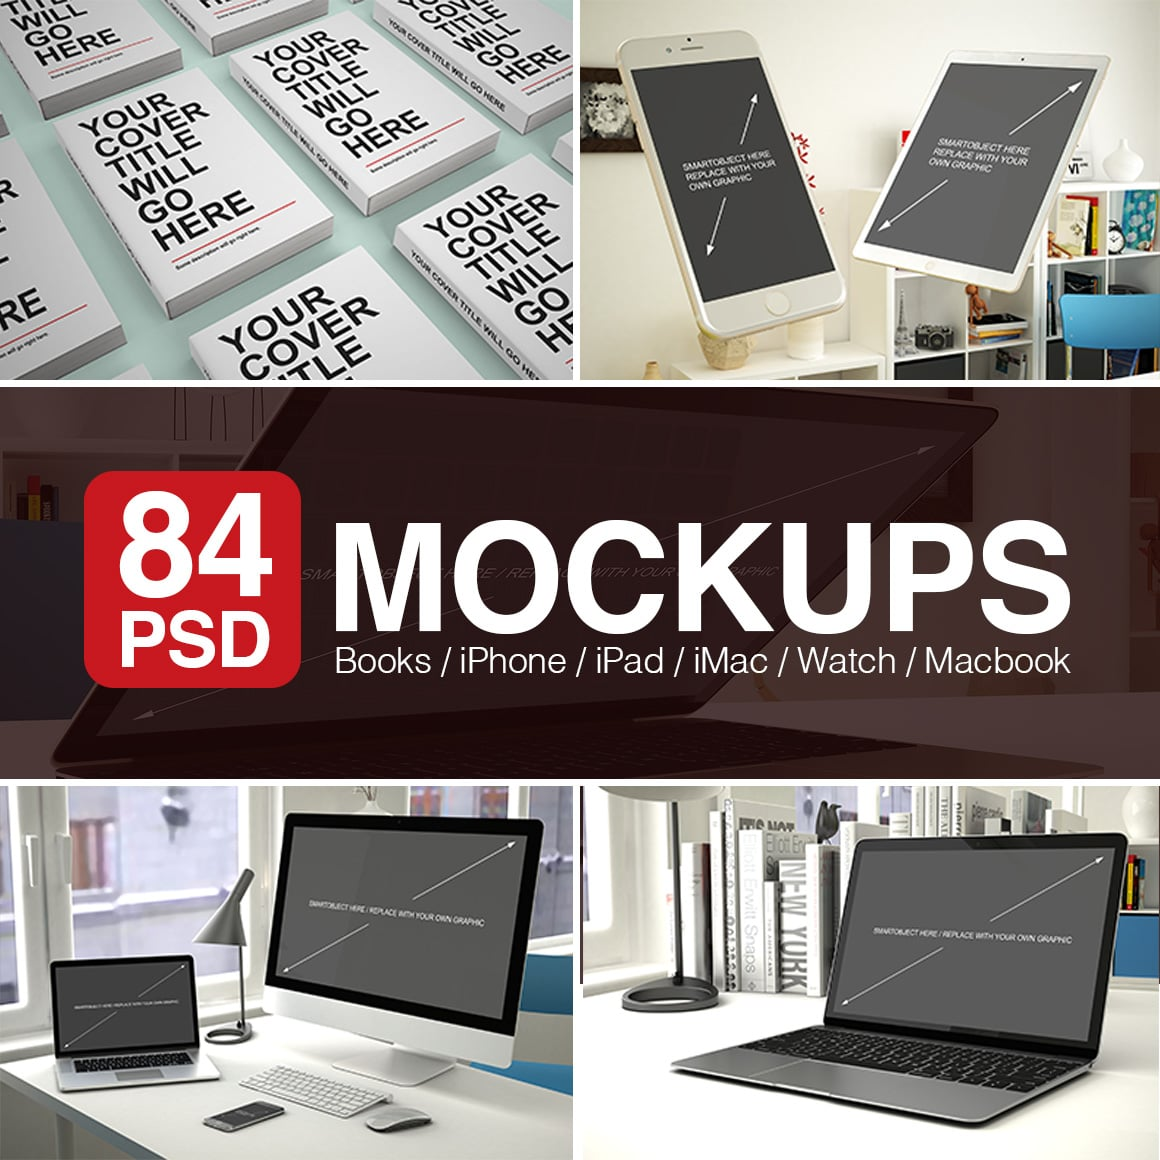 Apple Device Mockups: PSD Mockups 2021 main cover.